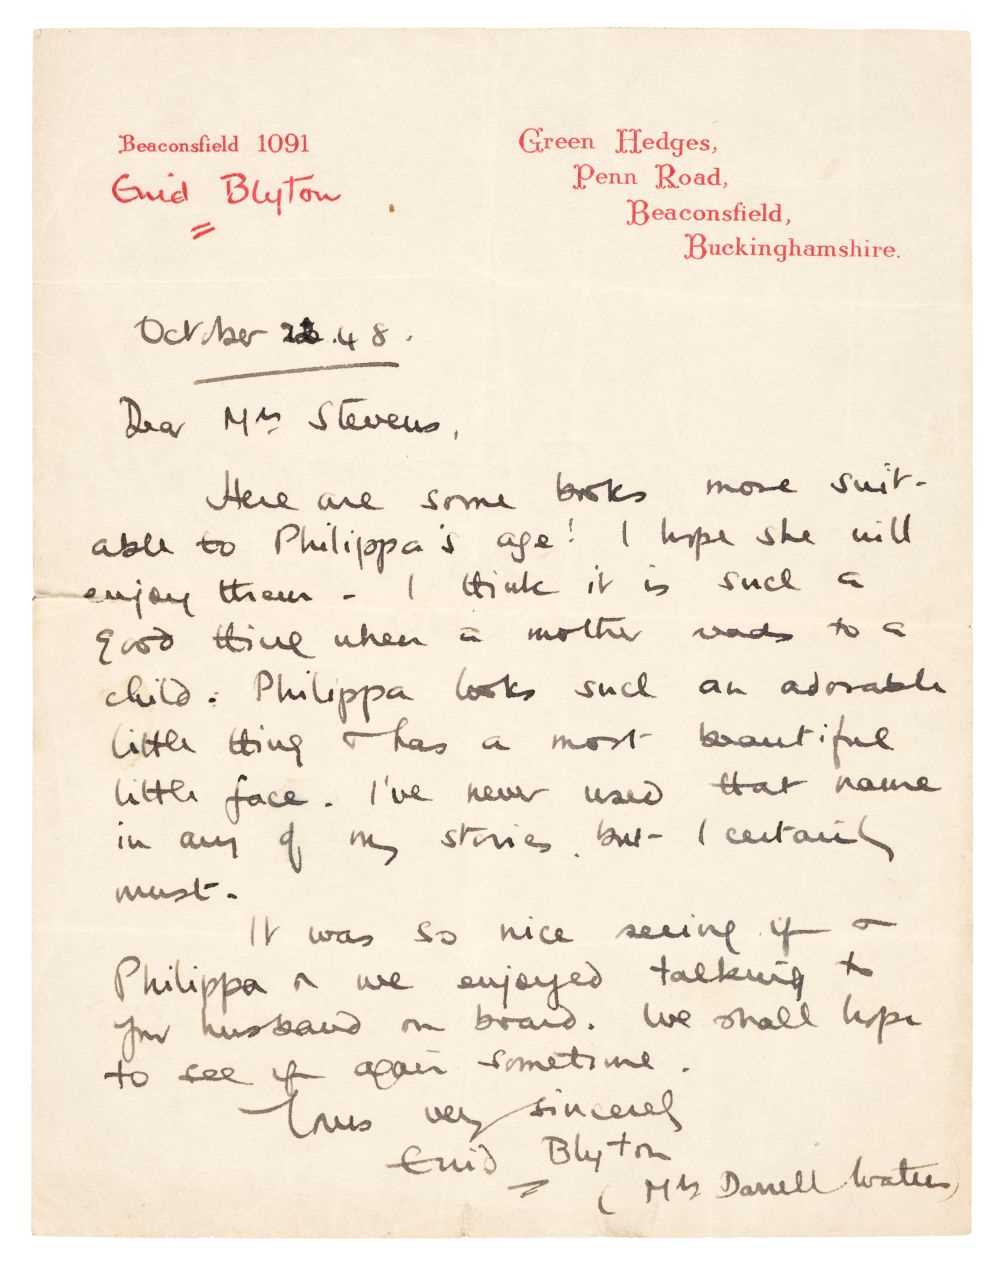 Lot 472 - Blyton (Enid, 1897-1968). Autograph letter signed 'Enid Blyton (Mrs Darrell Waters)',  1948